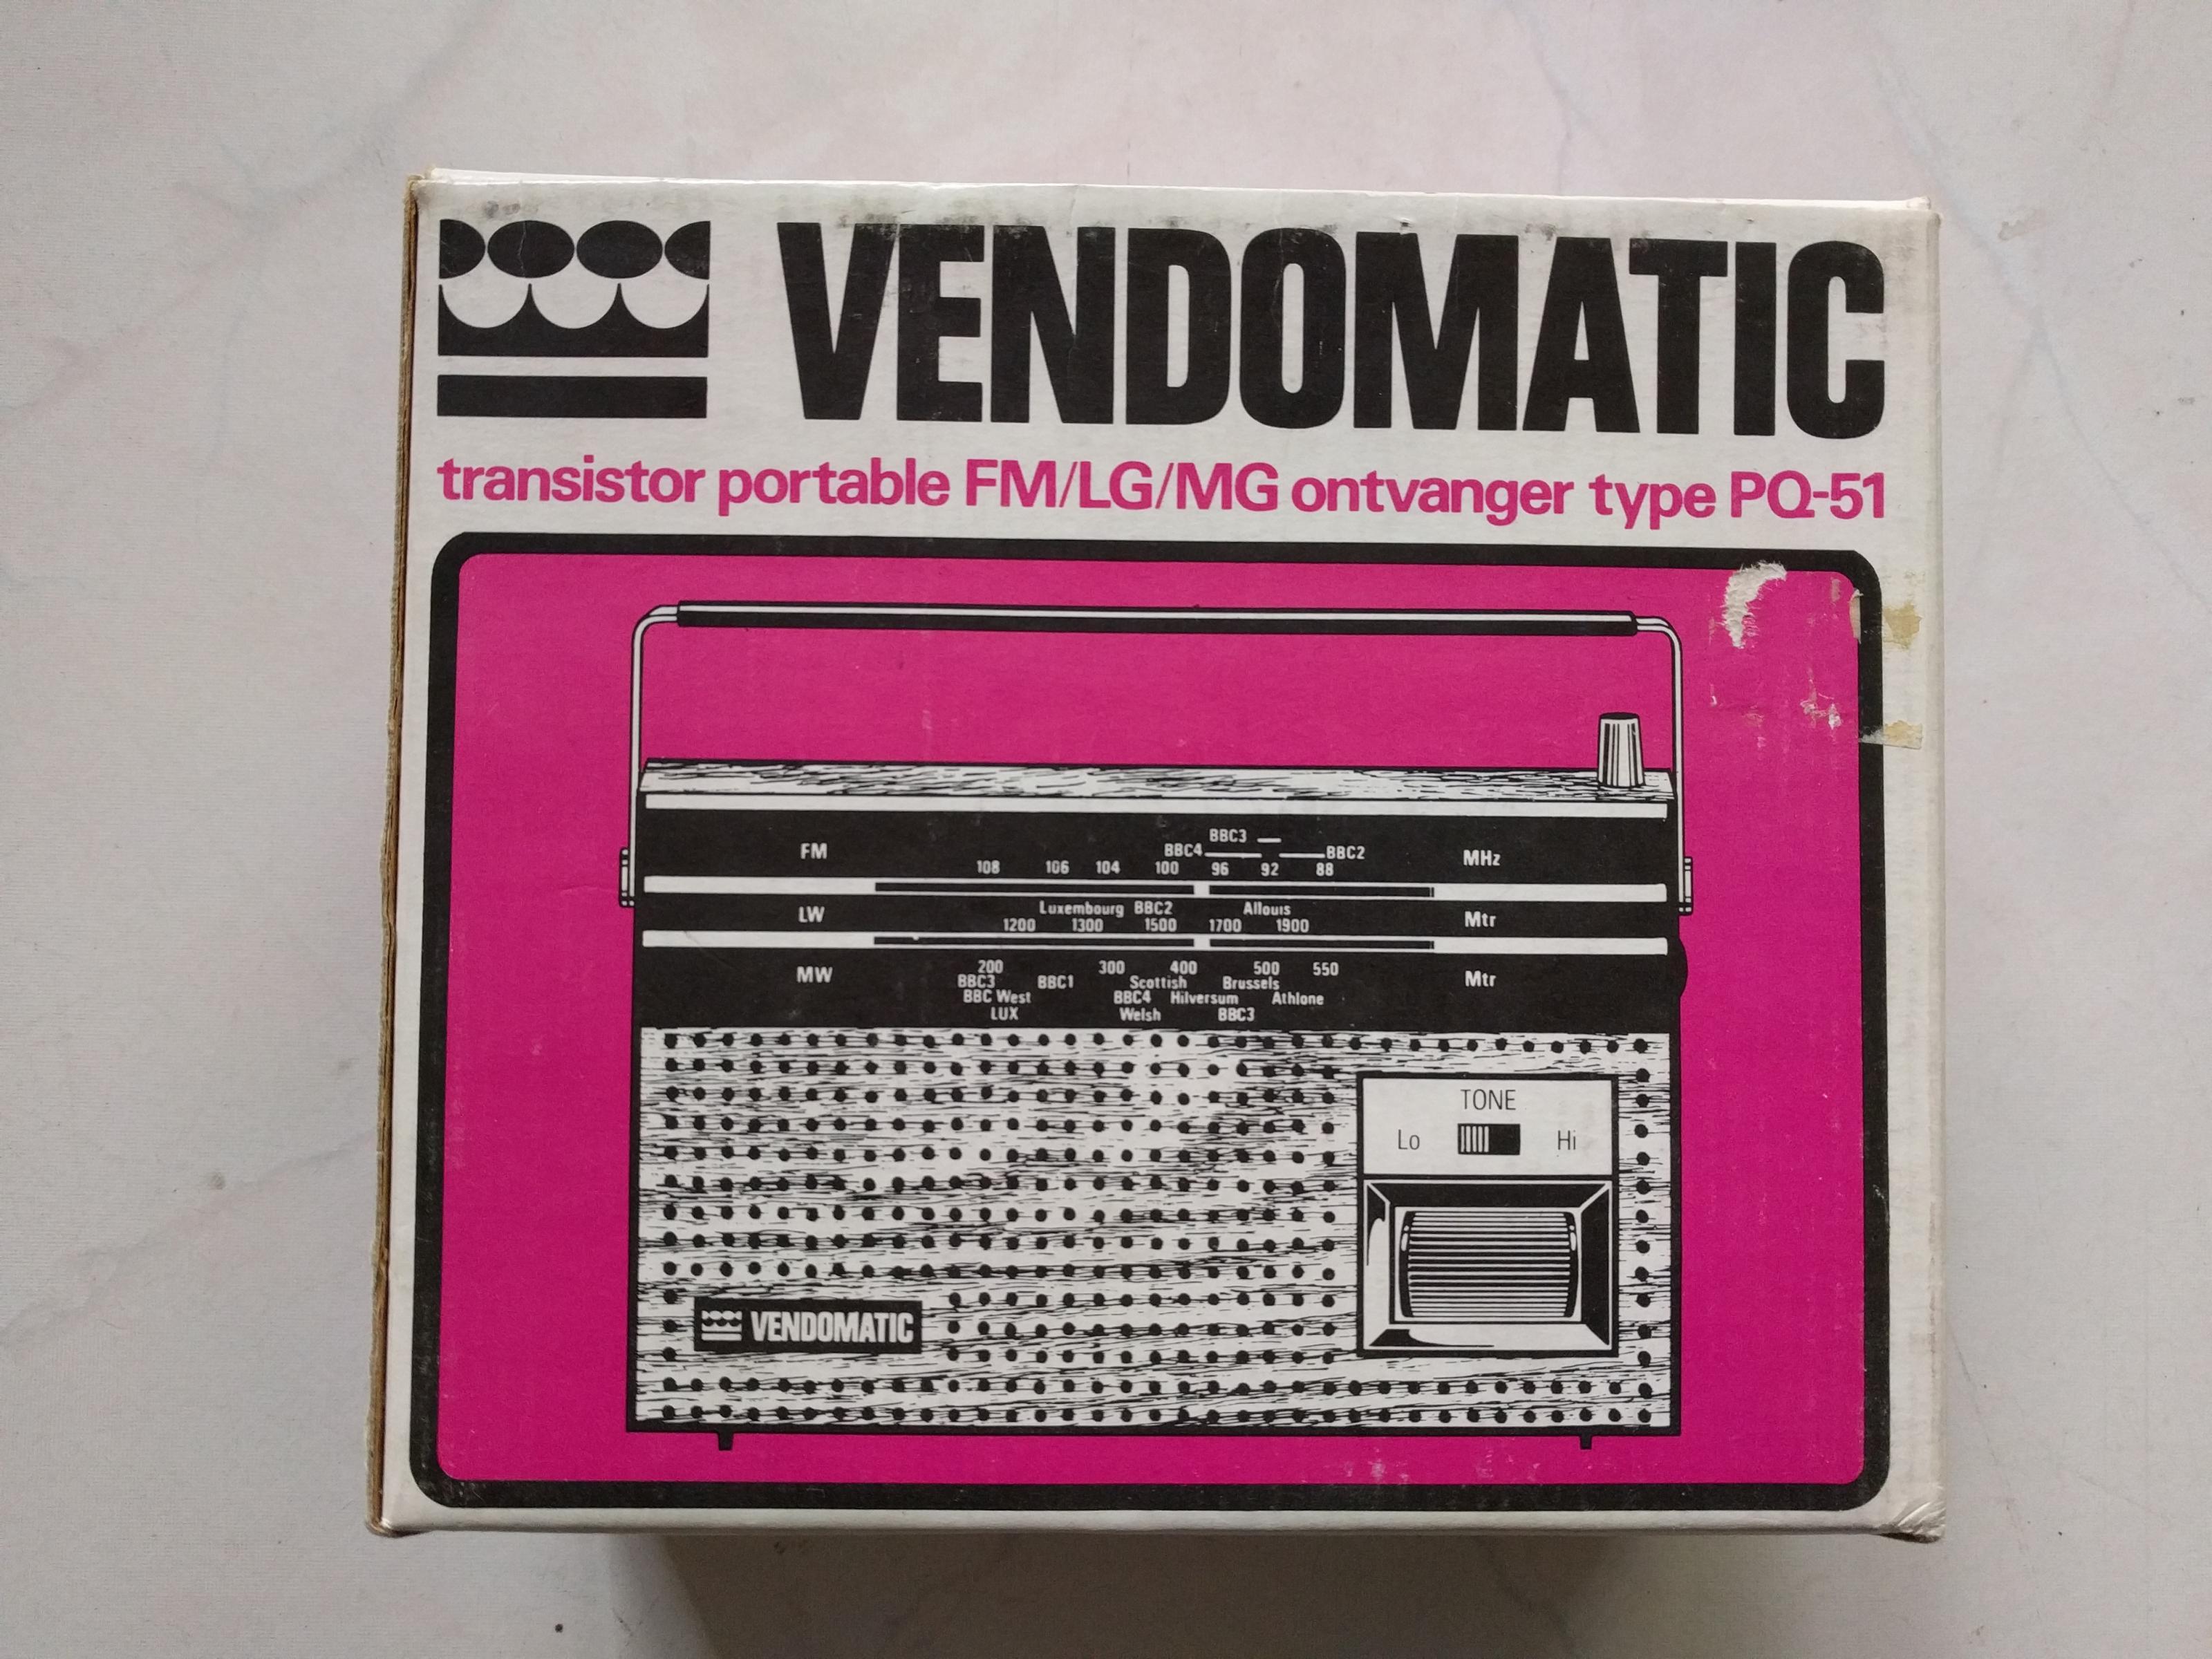 Vendomatic_PQ-51-3.jpg